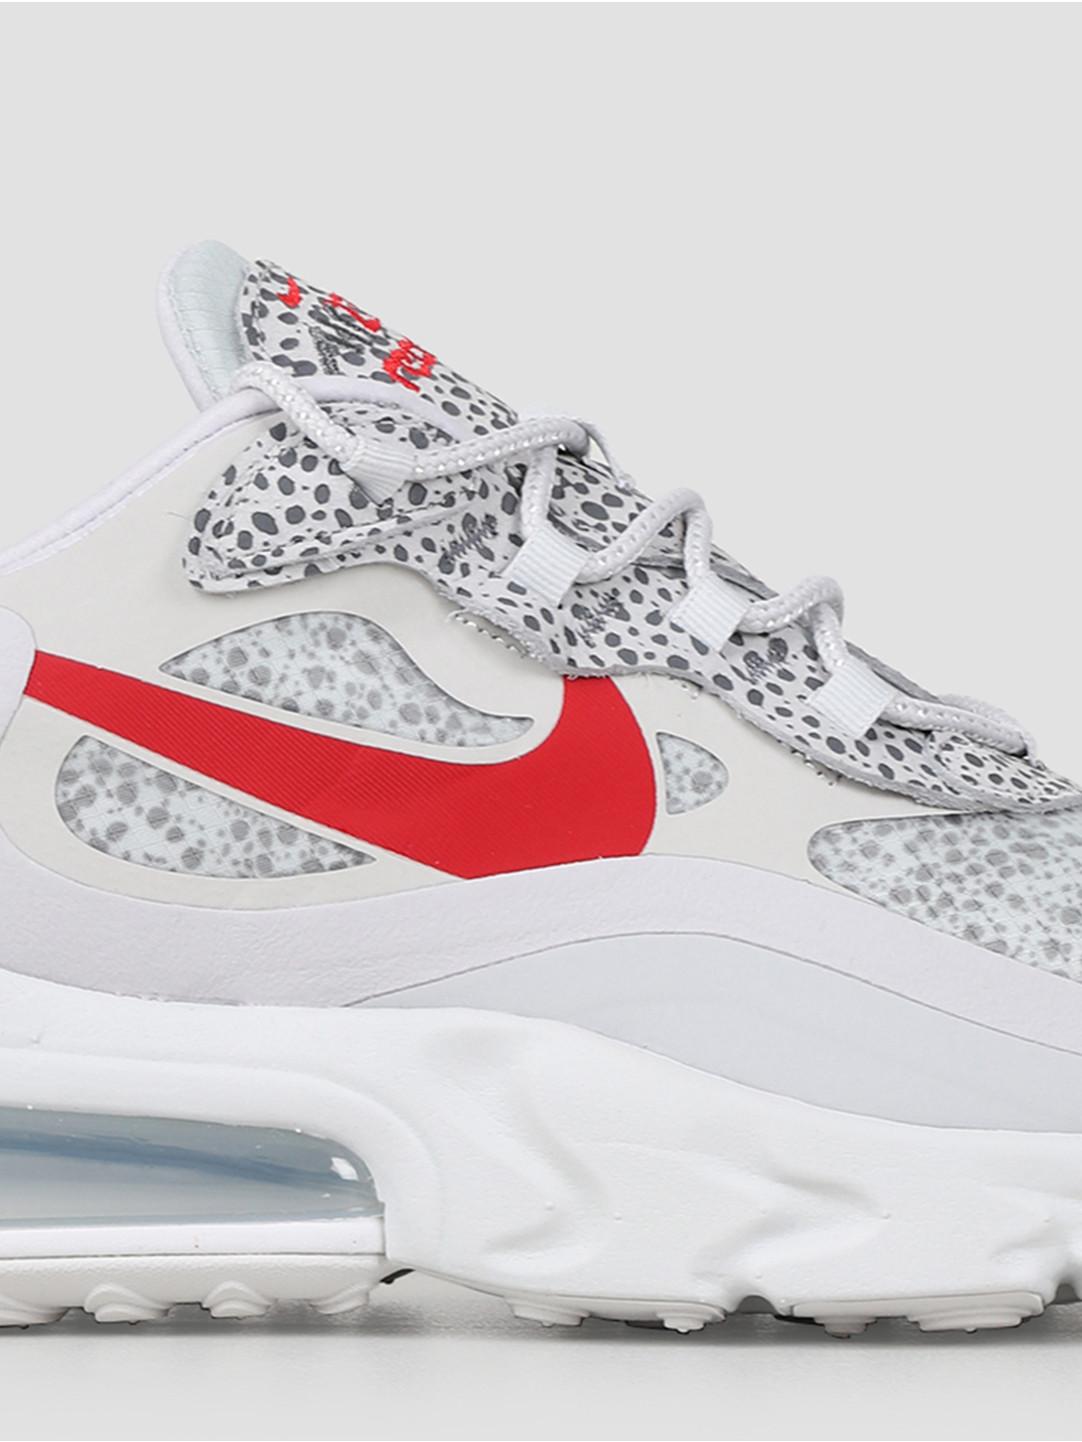 Nike Air Max 270 React (White Grey)